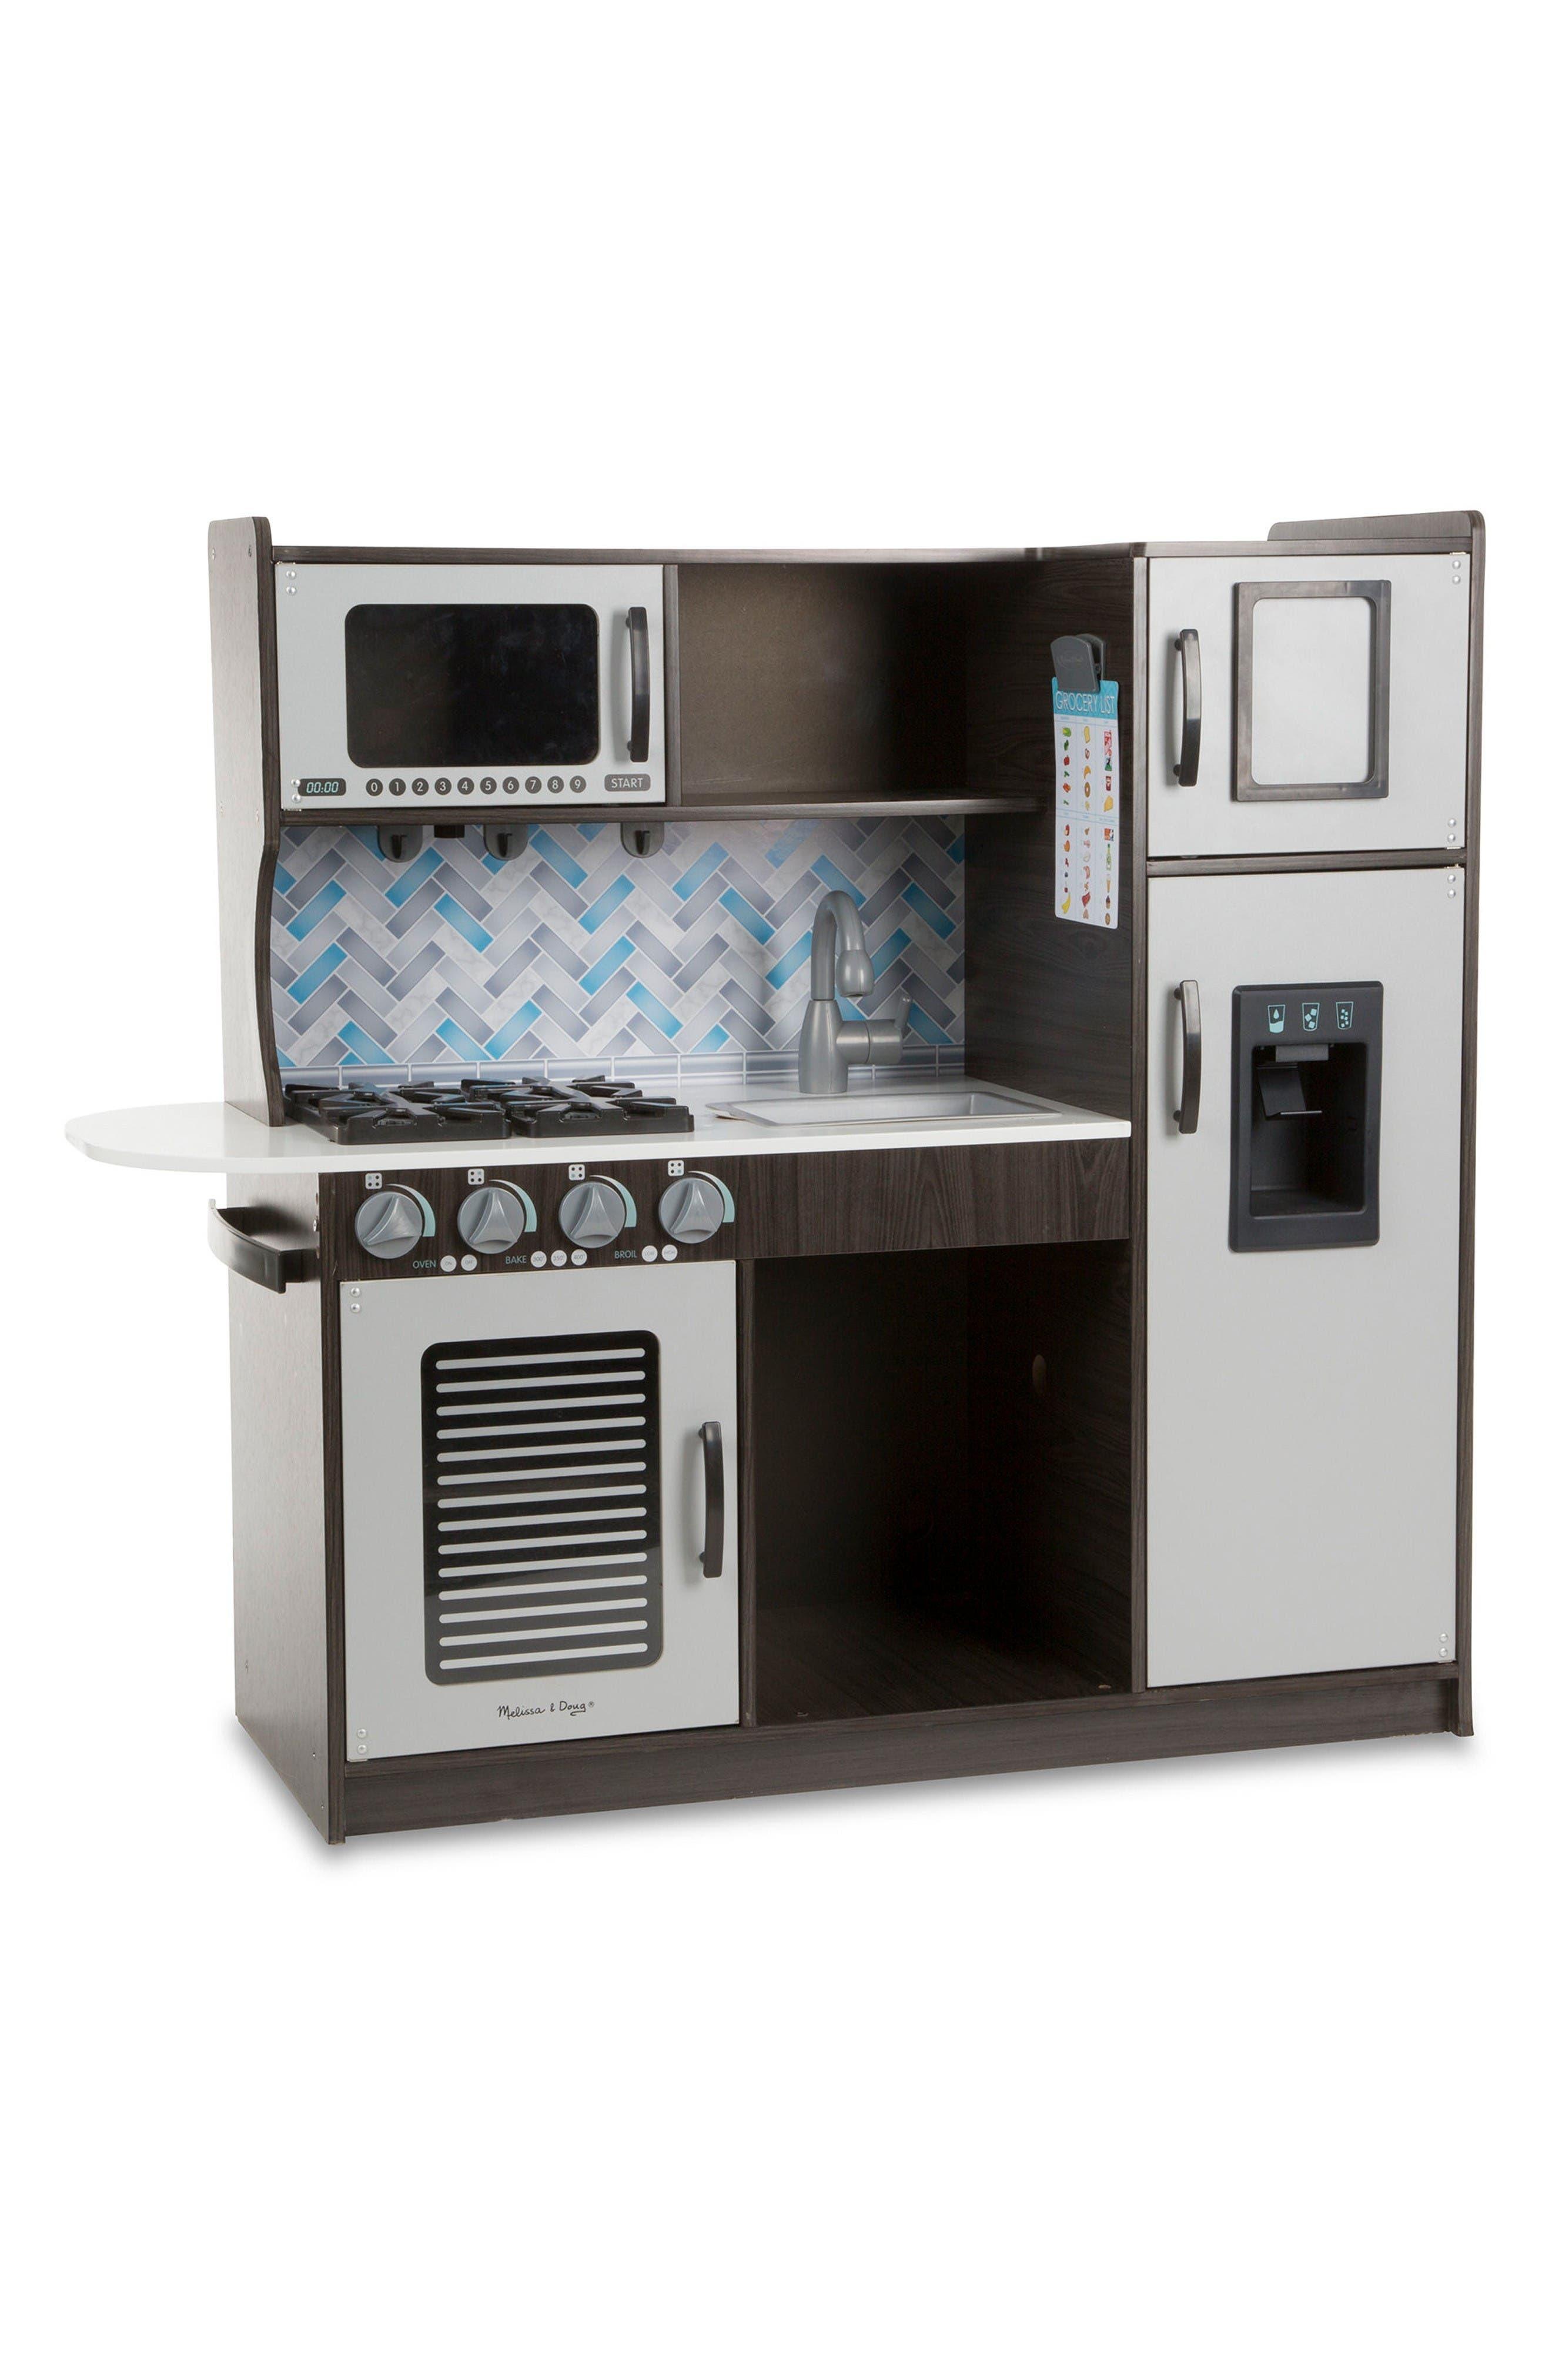 Alternate Image 1 Selected - Melissa & Doug Wooden Chef's Kitchen